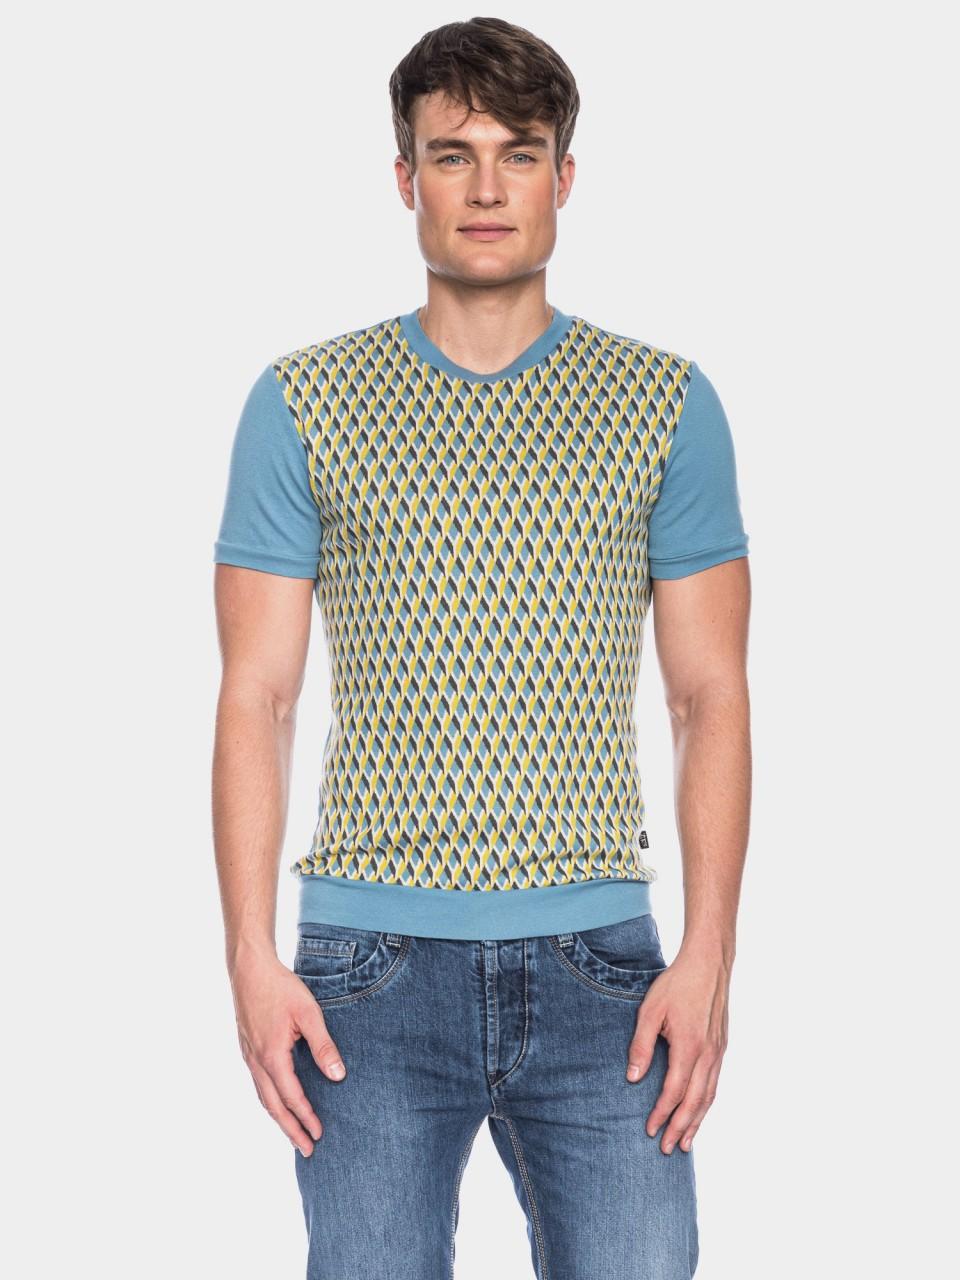 T-Shirt Birk CO 27/027 BL/YLL